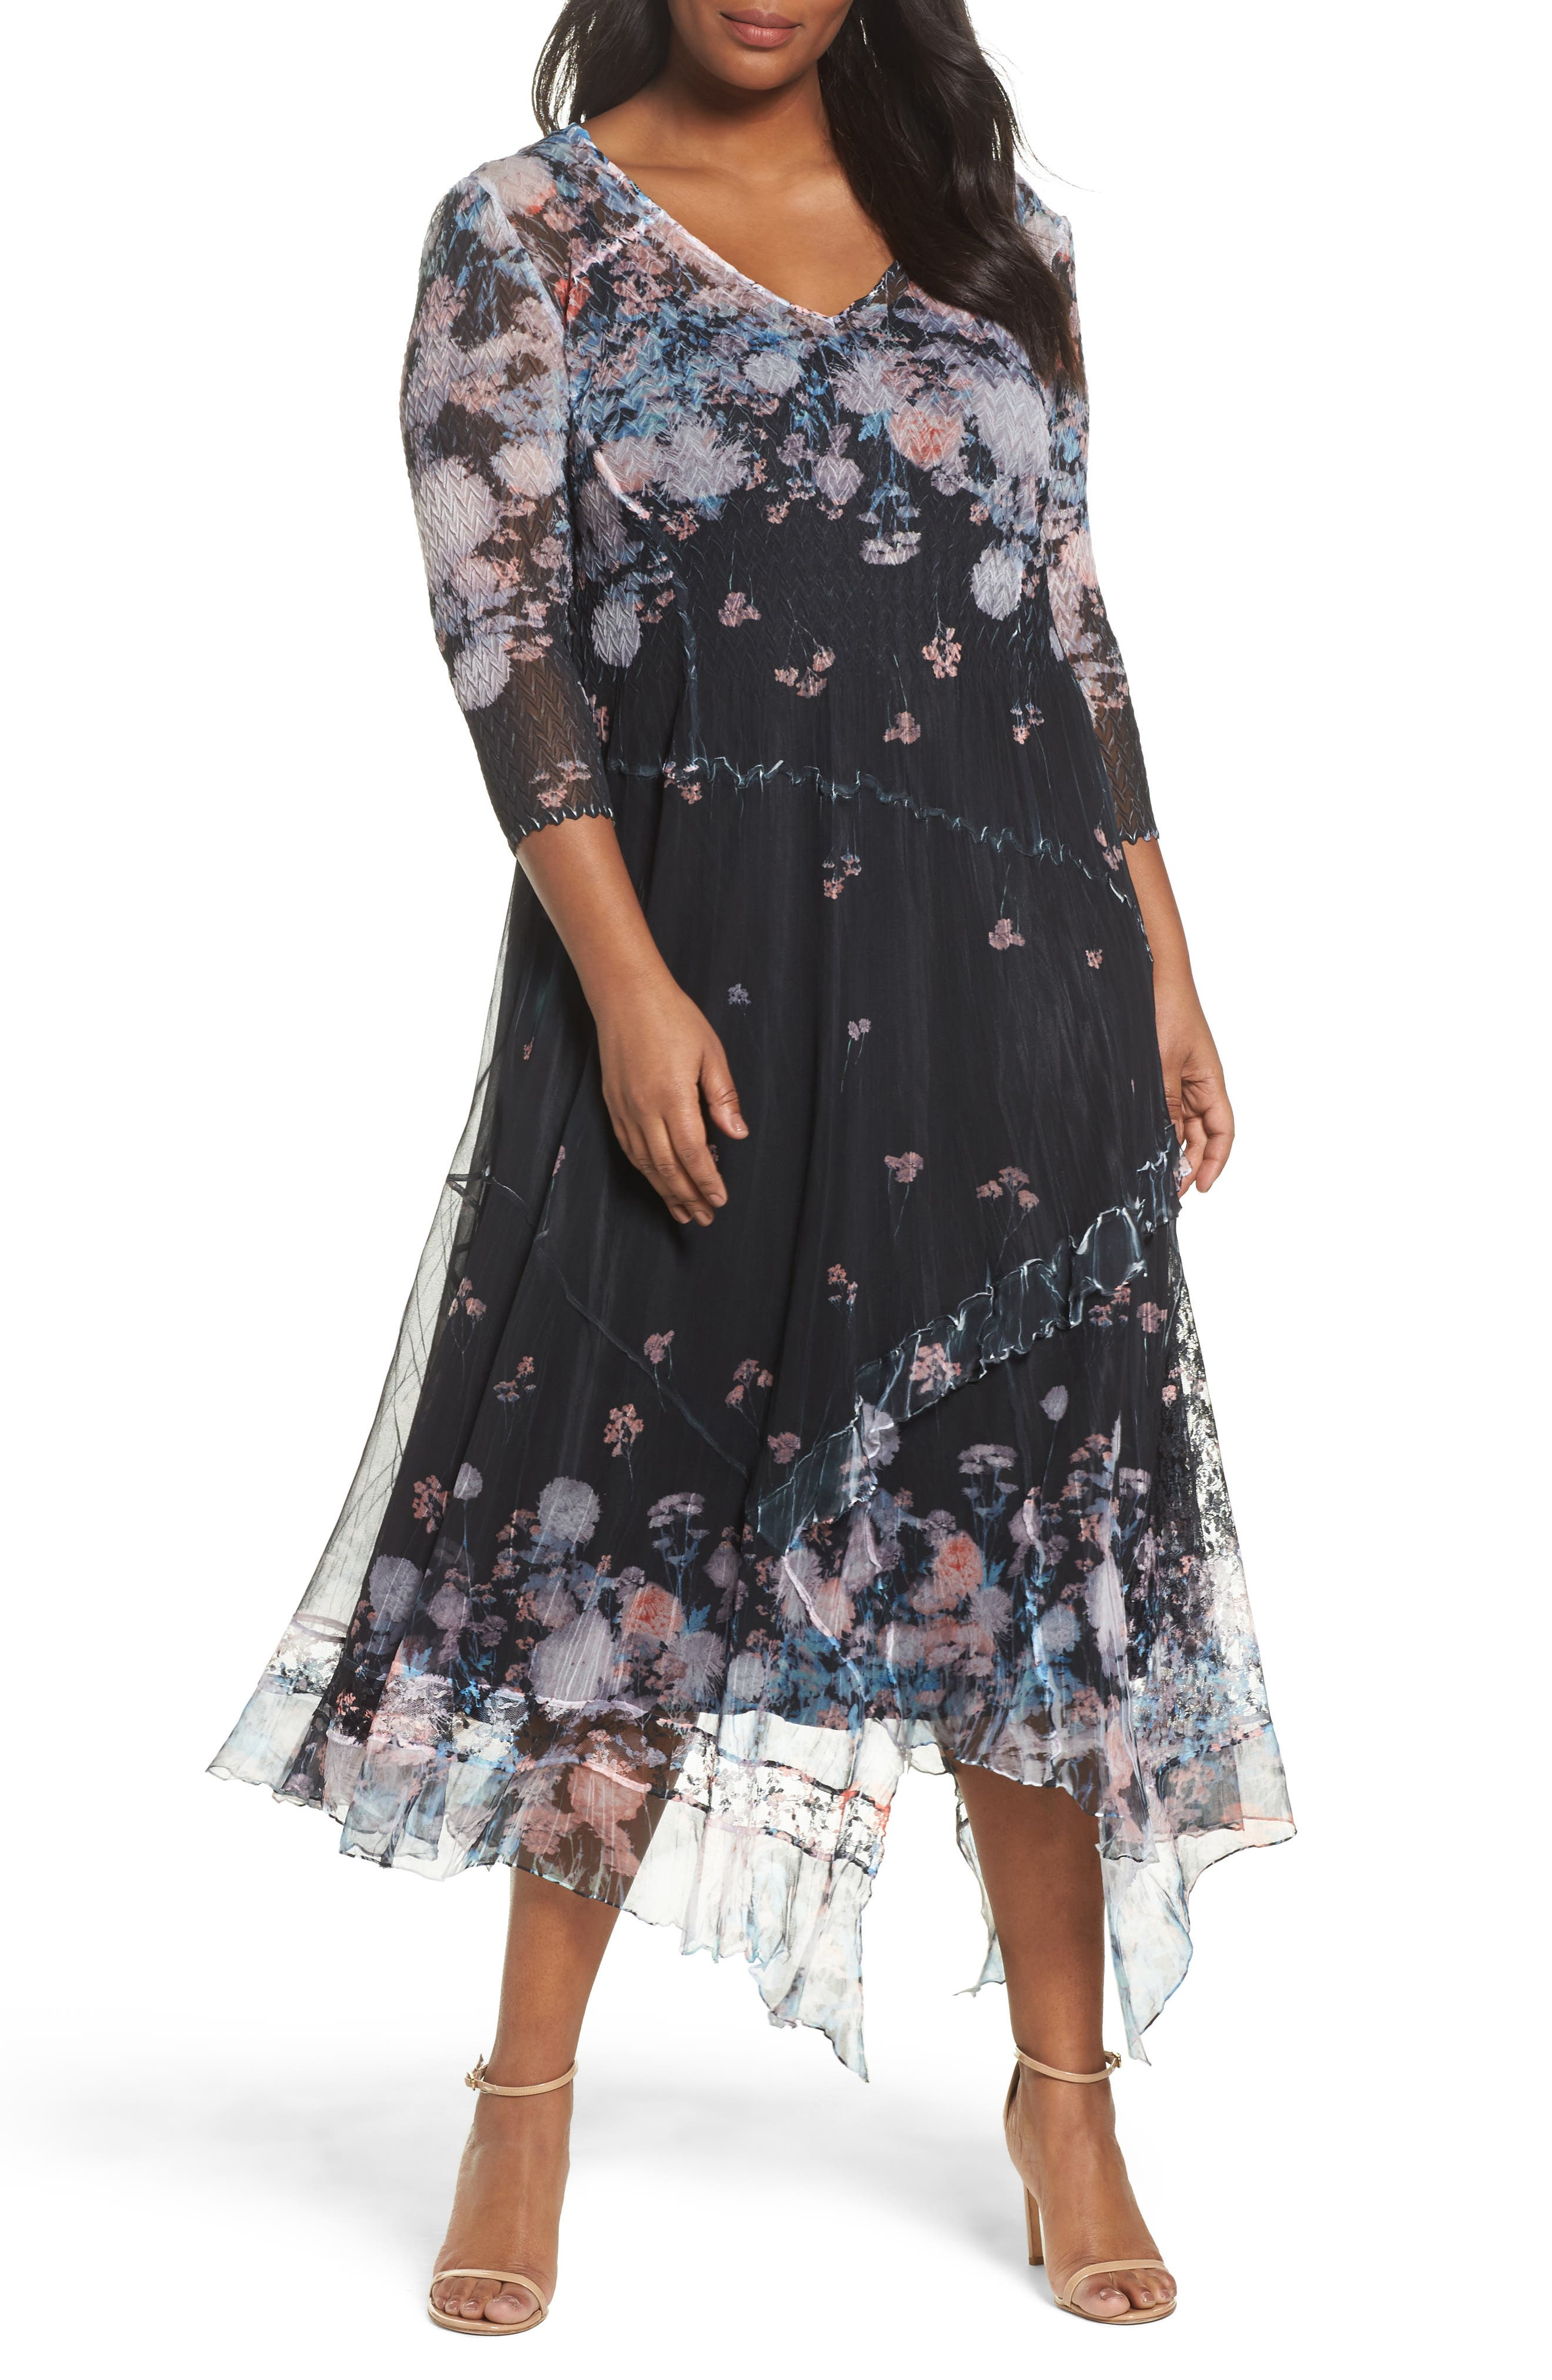 Alternate Image 1 Selected - Komarov Floral Print Handkerchief Hem Maxi Dress (Plus Size)